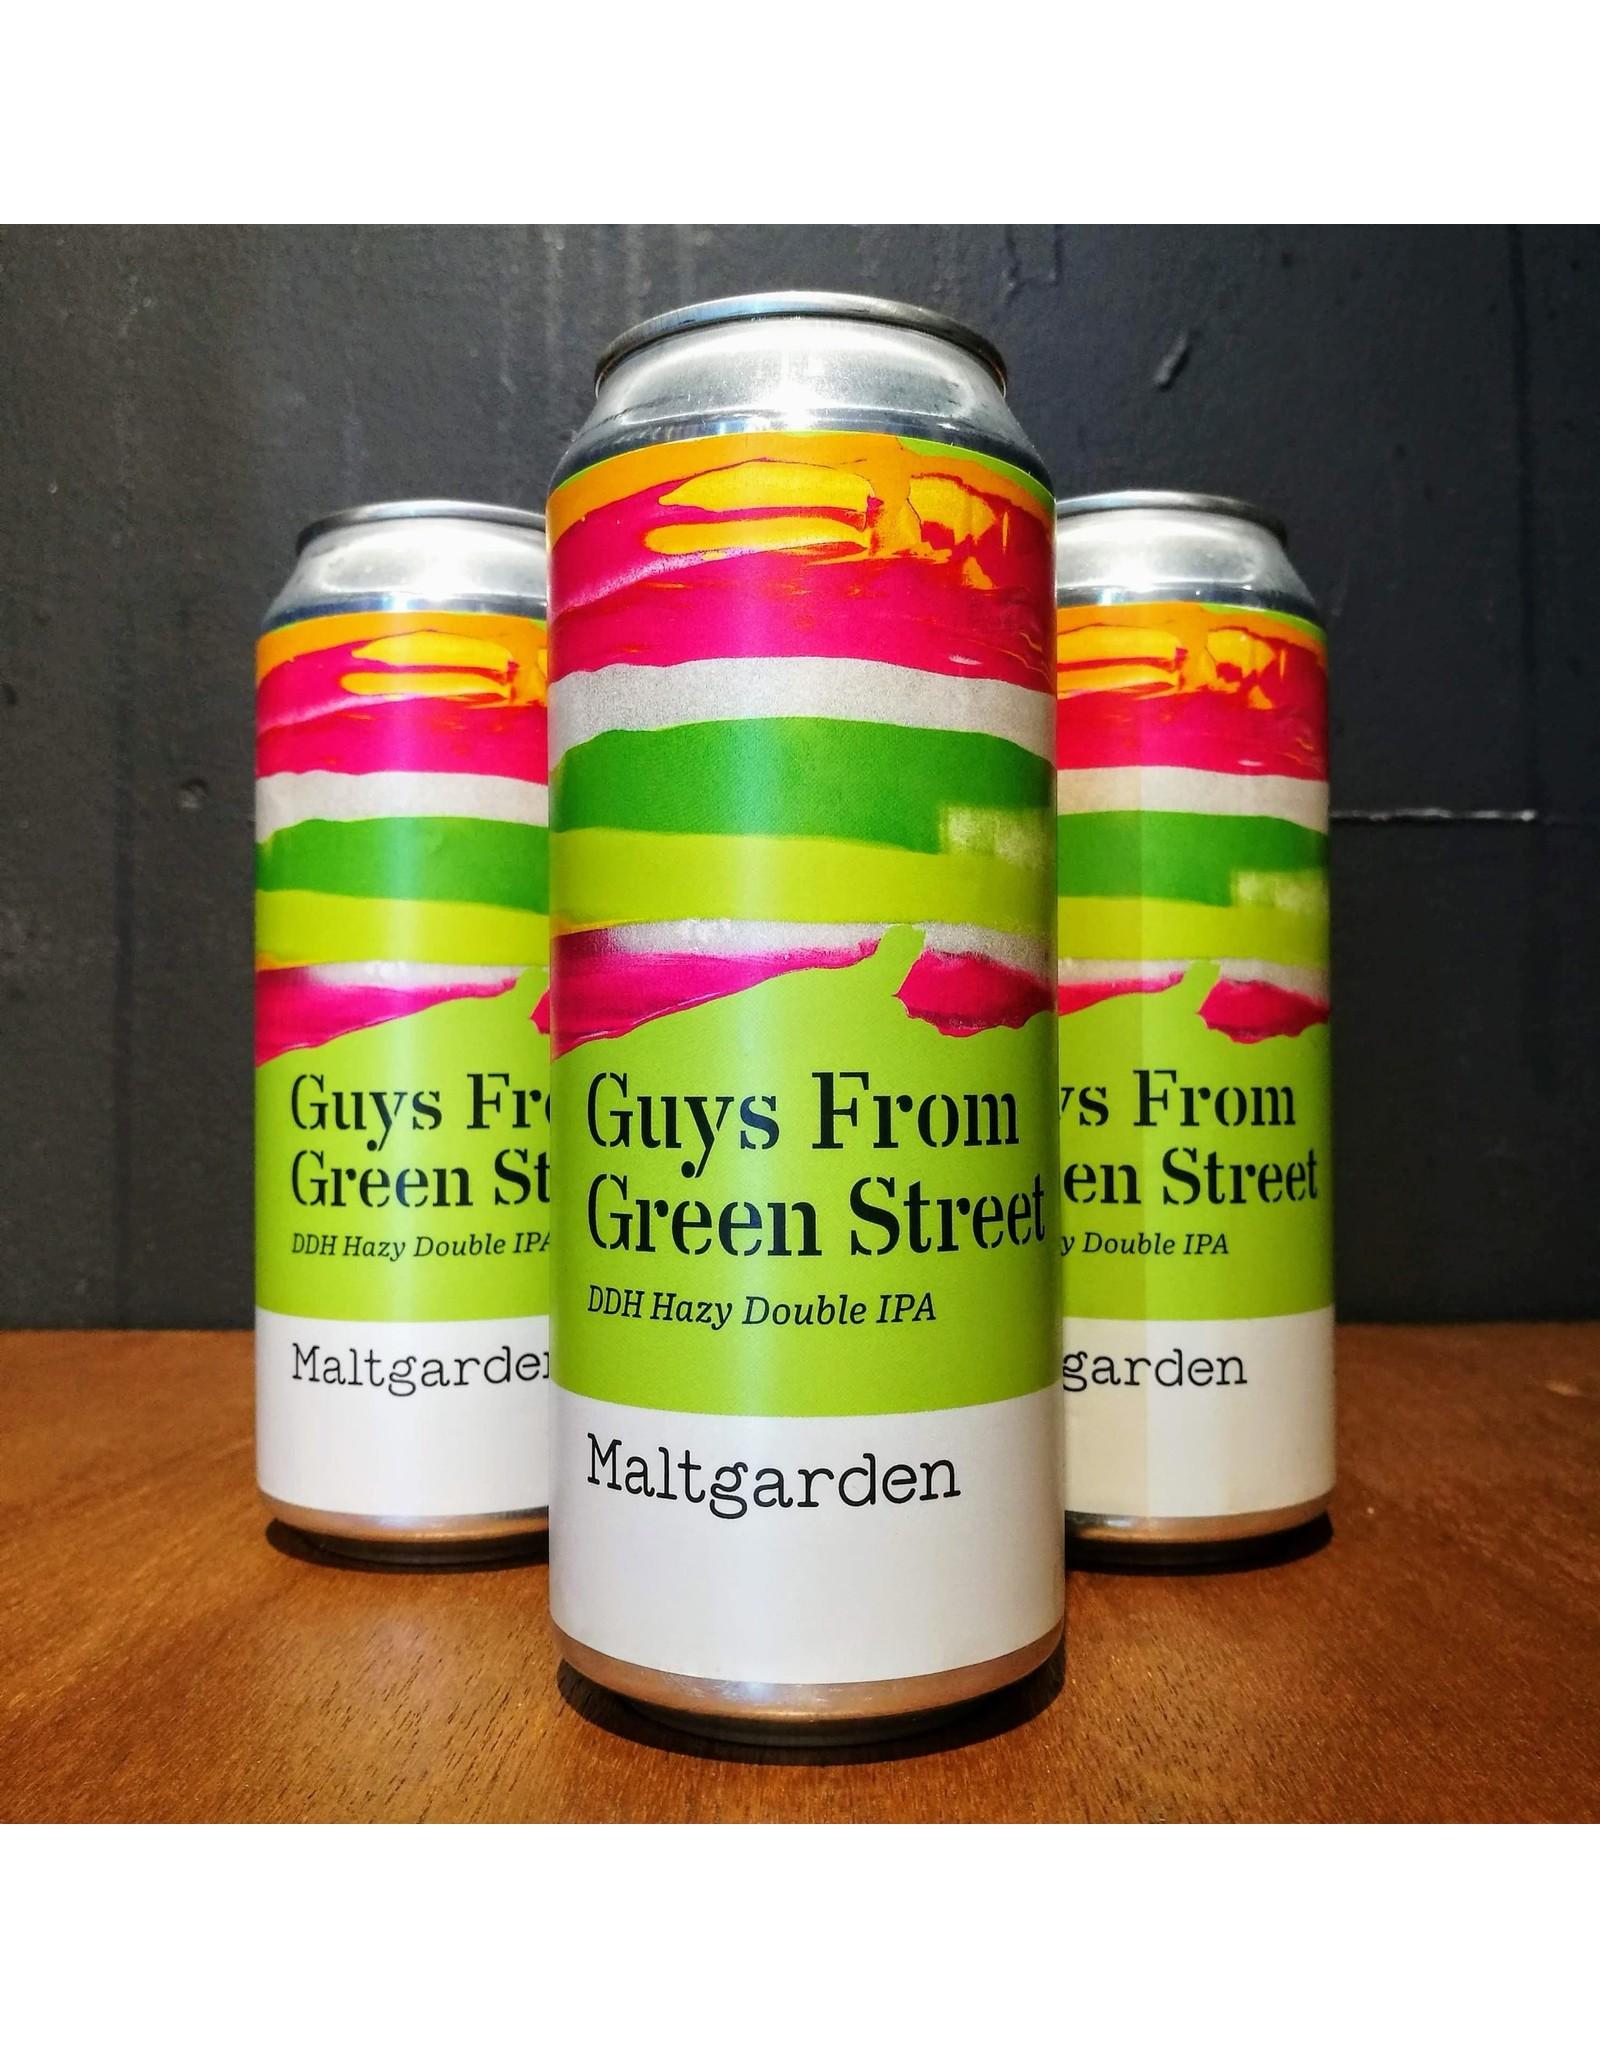 maltgarden Maltgarden - Guys from Green Street